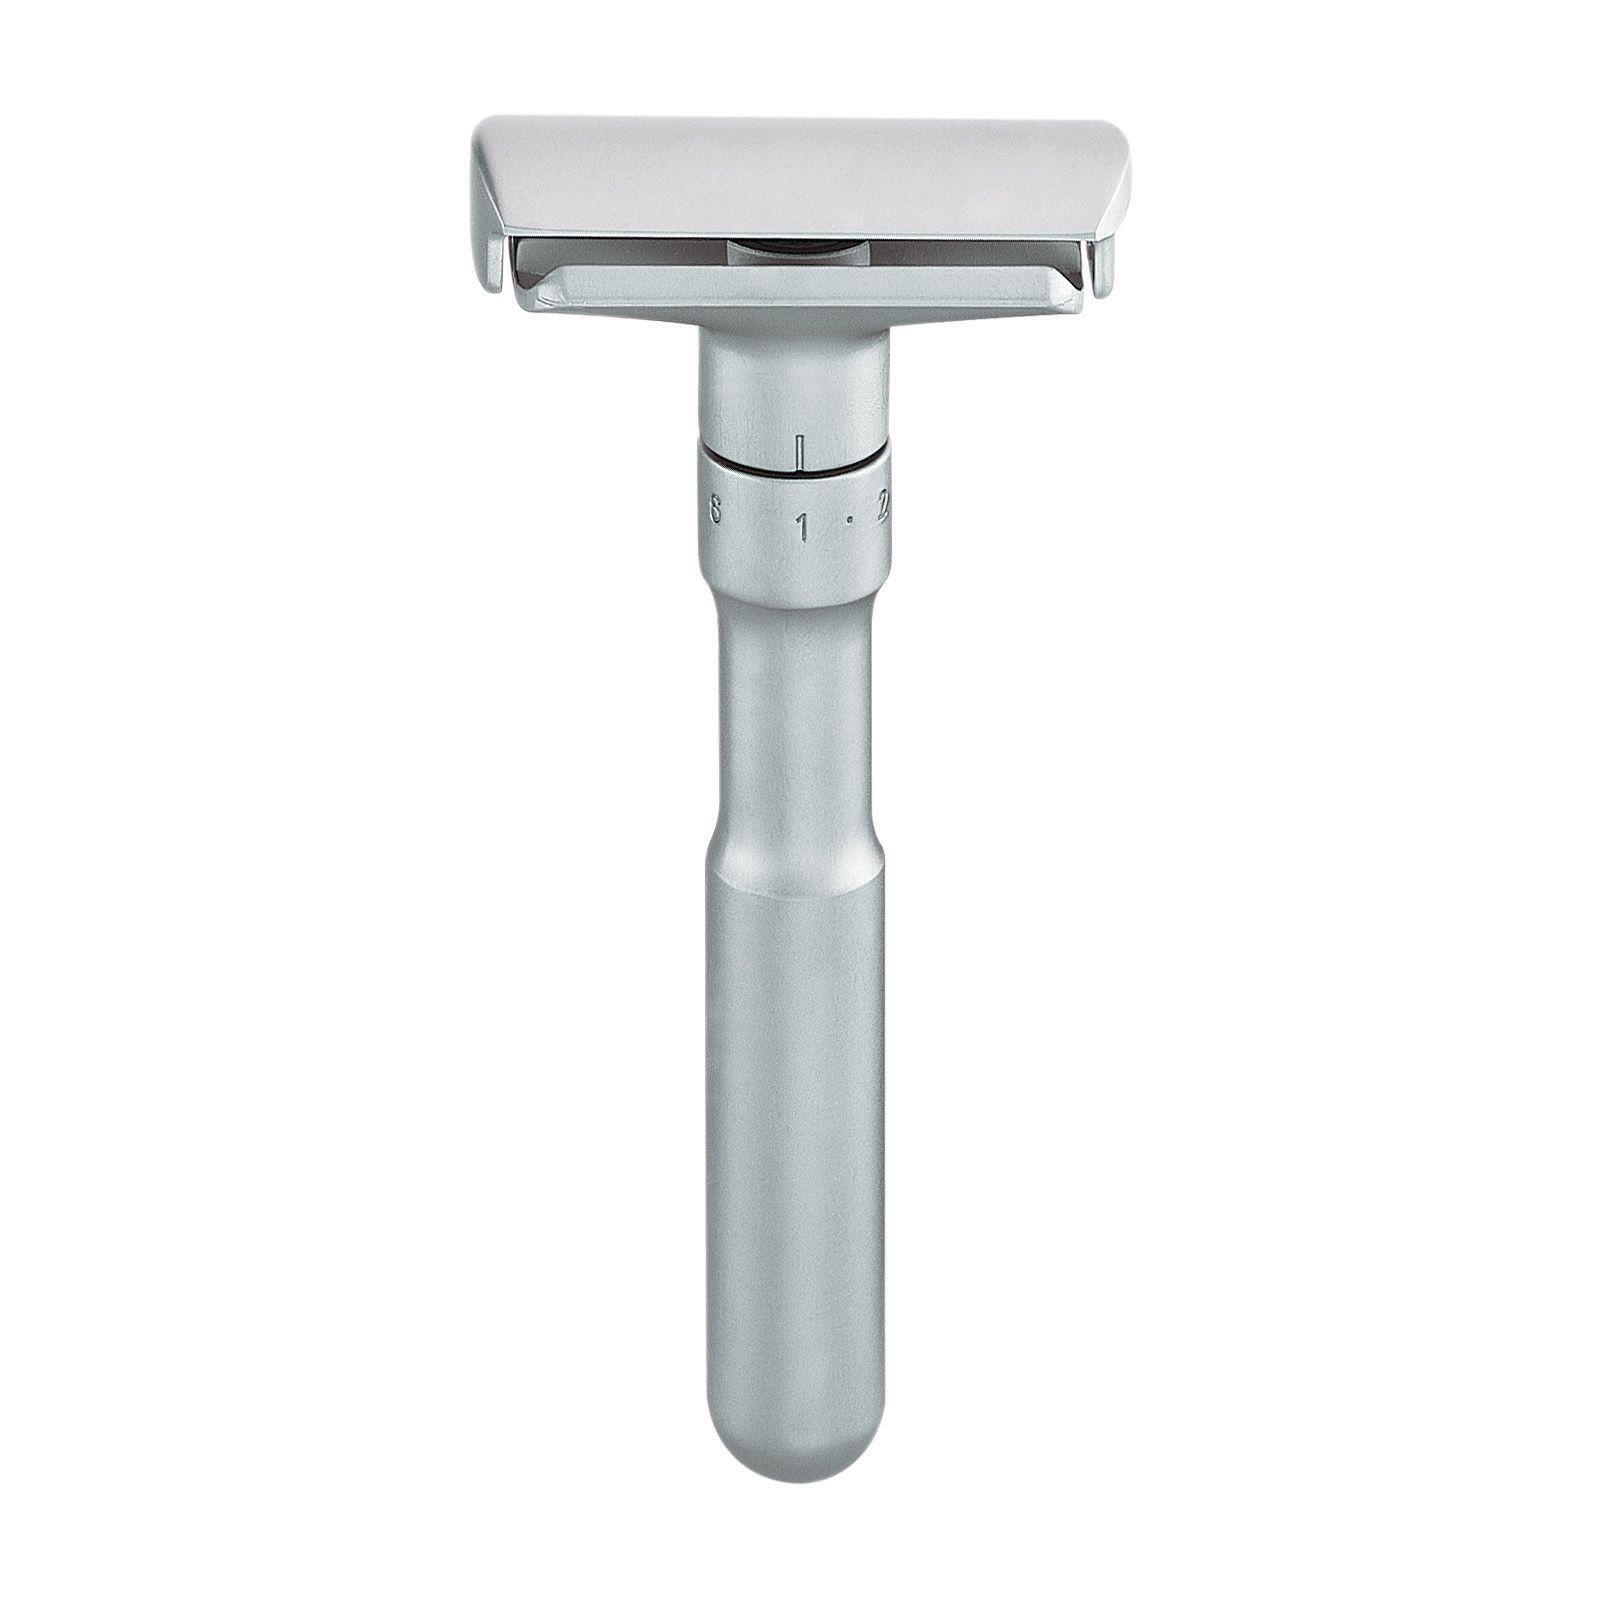 Merkur Futur Chrome Adjustable Double Edge Safety Razor Safety Razor Wet Shaving Chrome